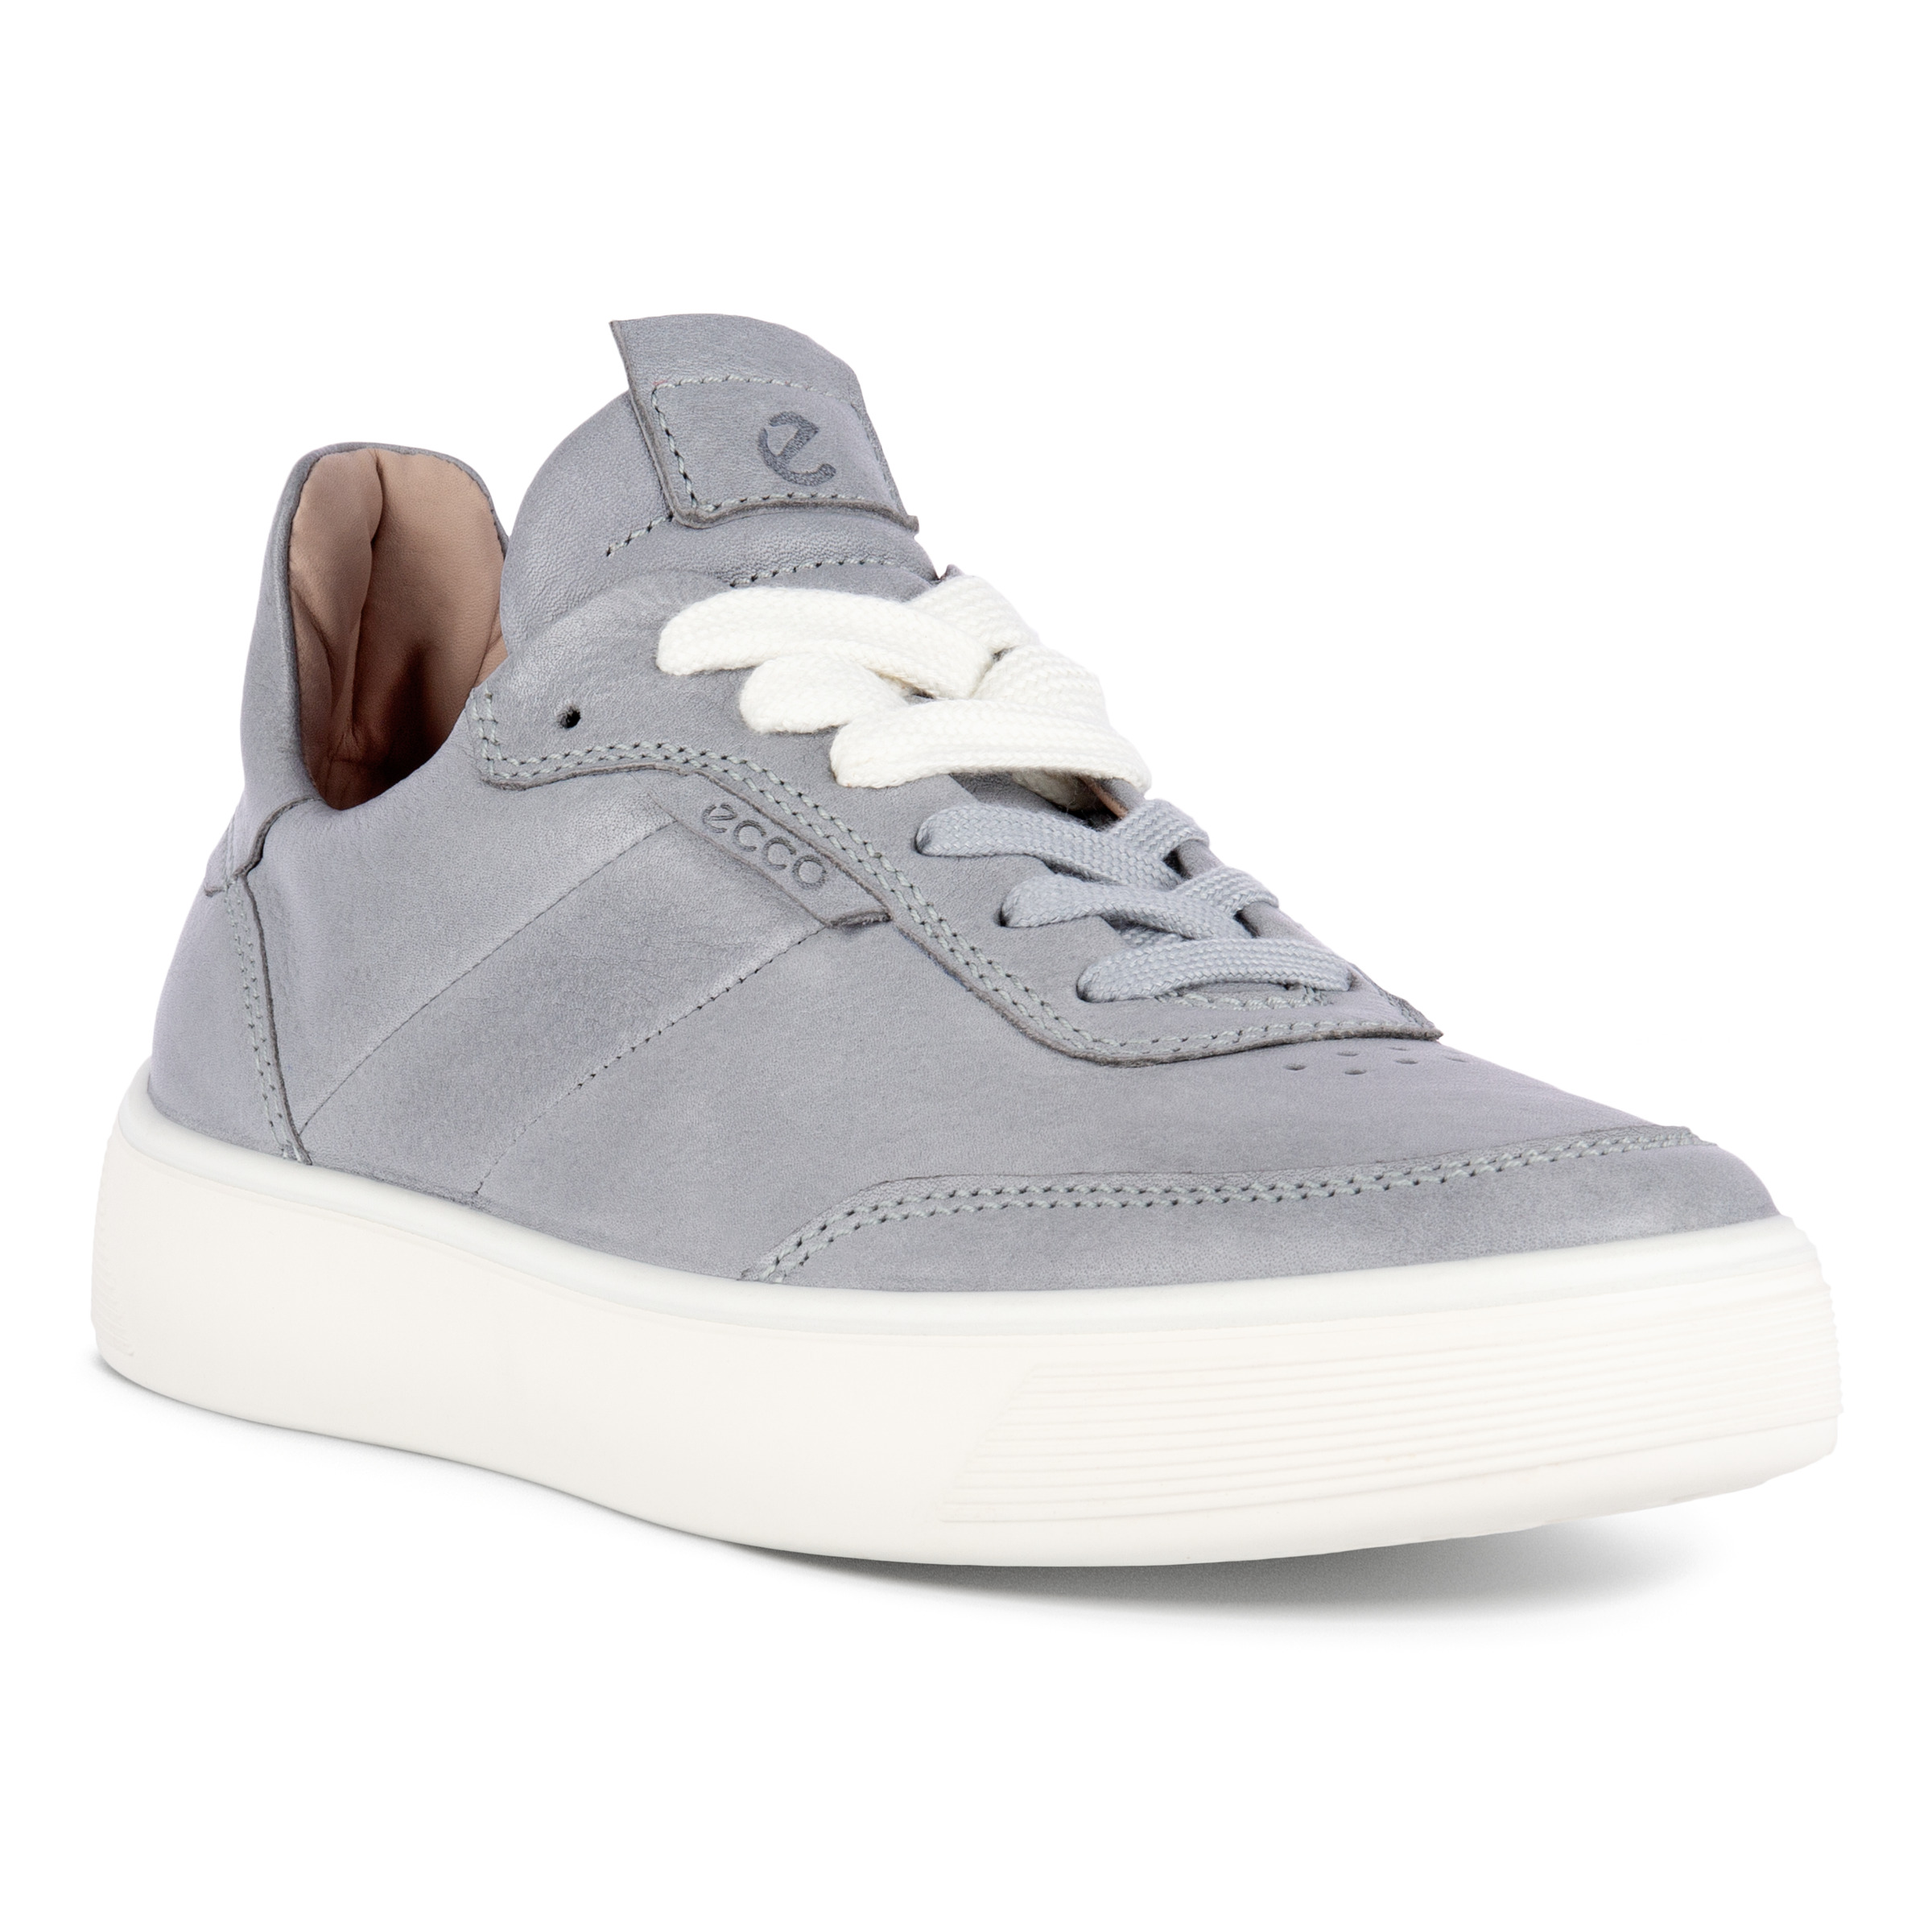 Ecco Street Tray W sneakers